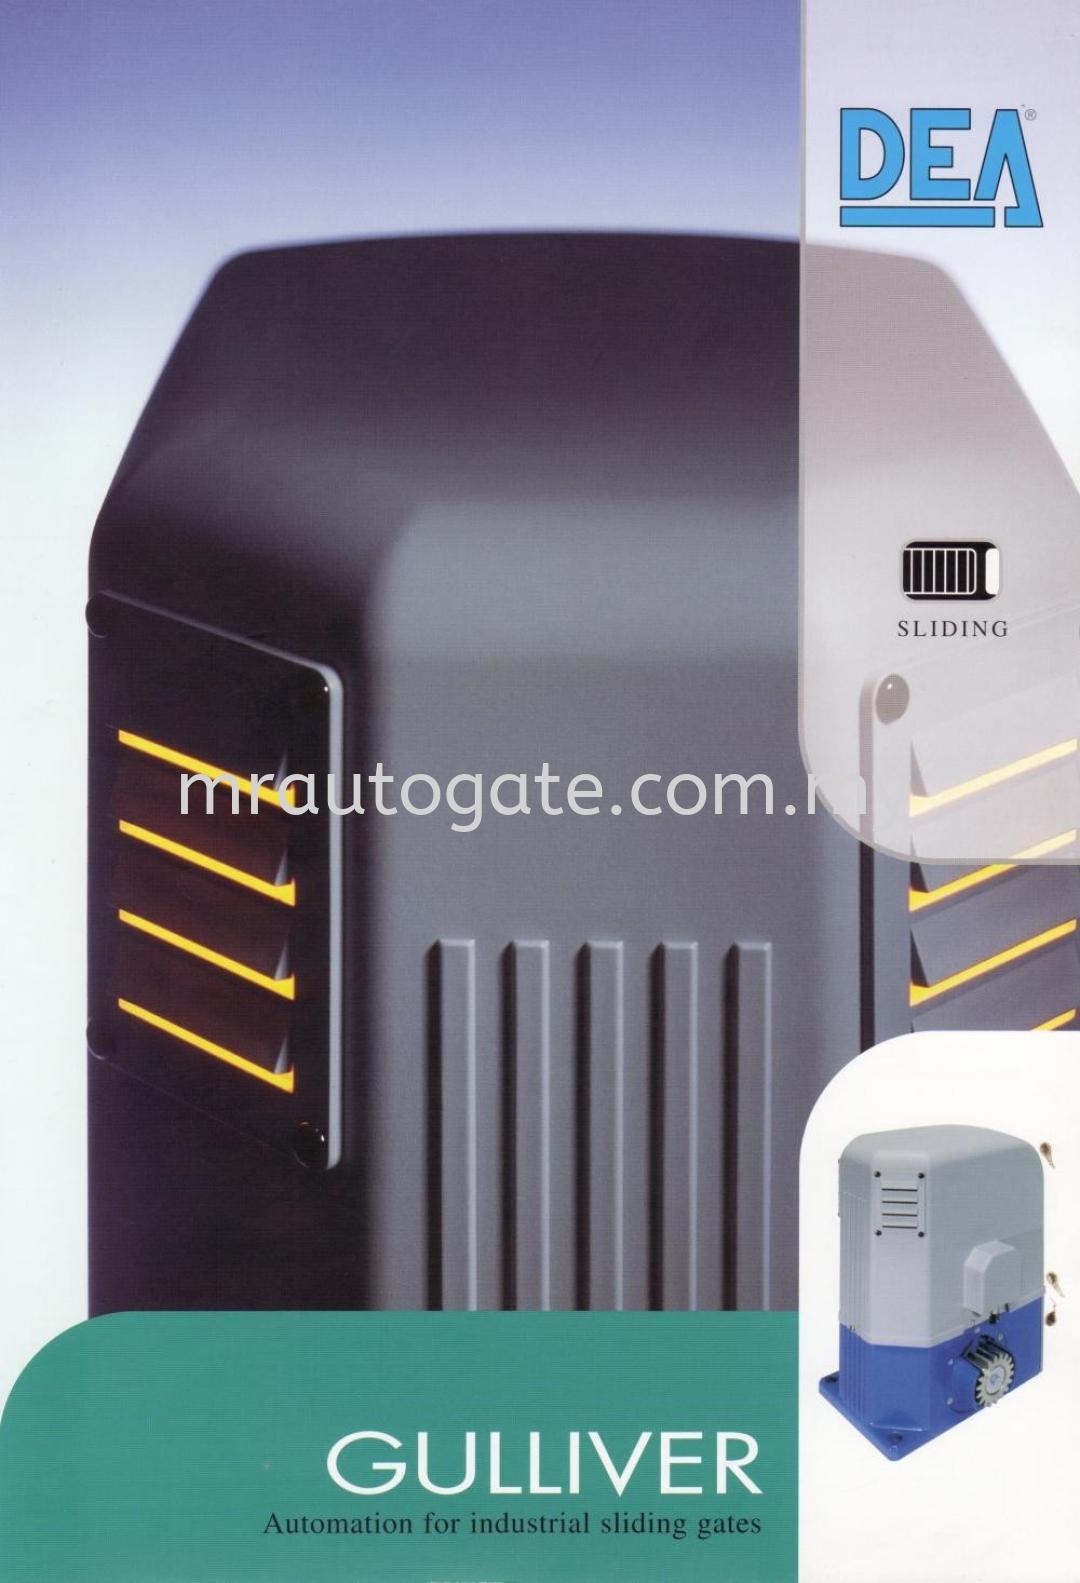 DEA Gulliver 1500 AC Sliding Auto Gate